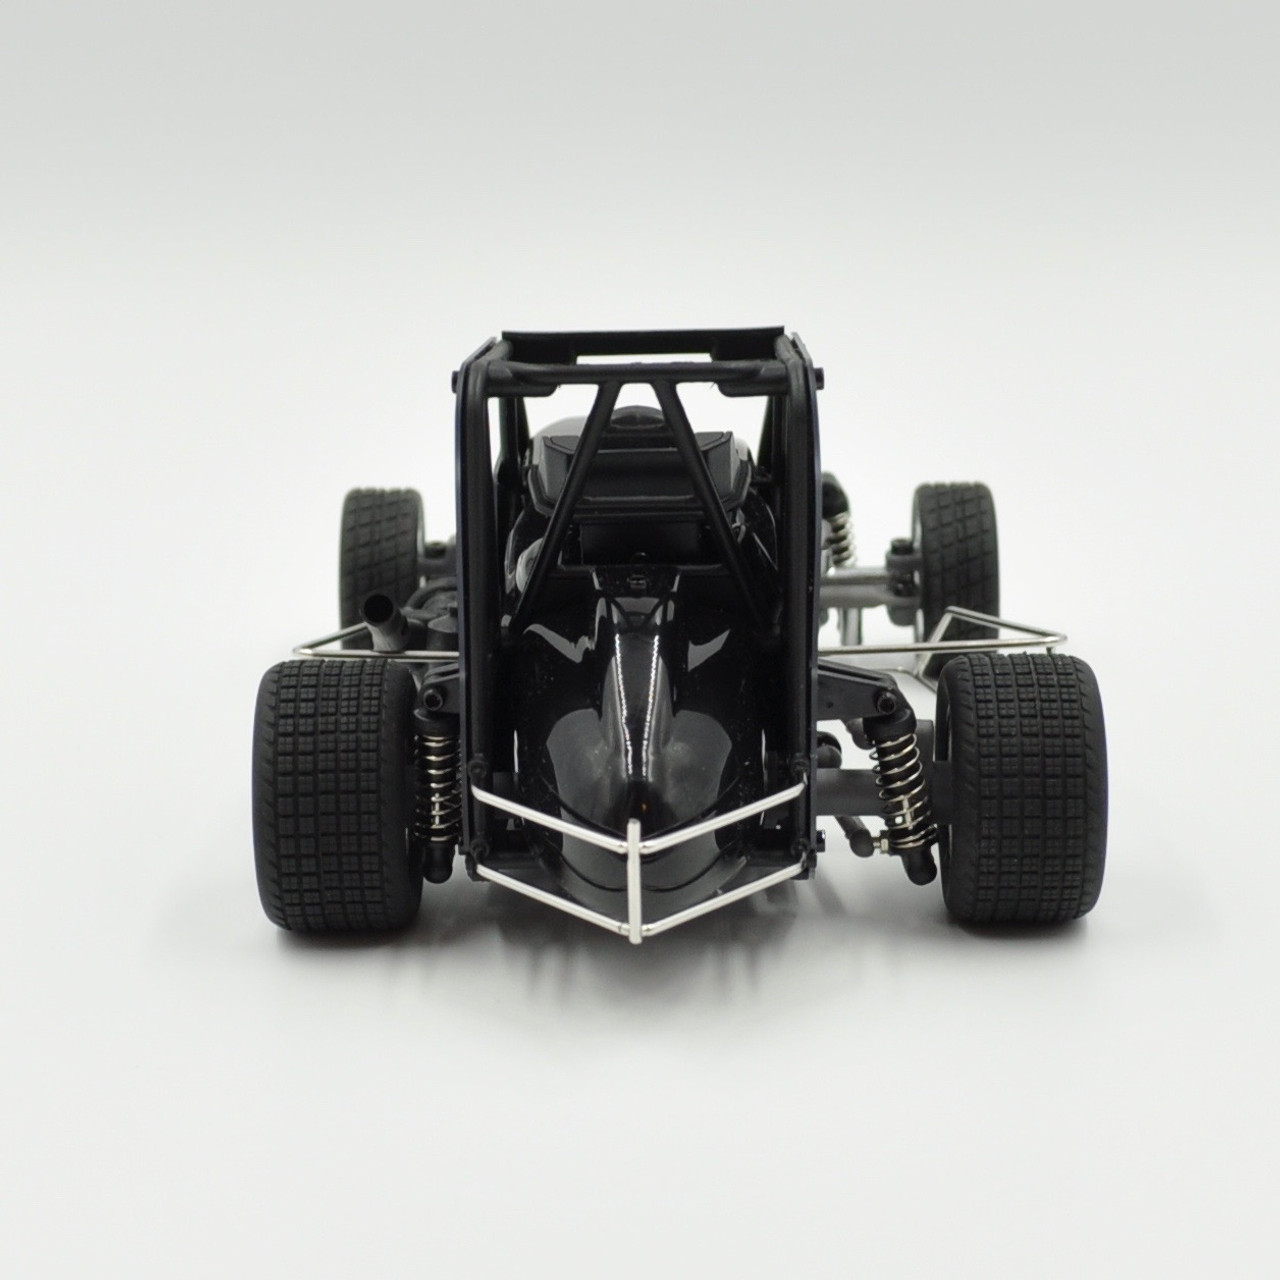 1/18 Midget, Black, RTR